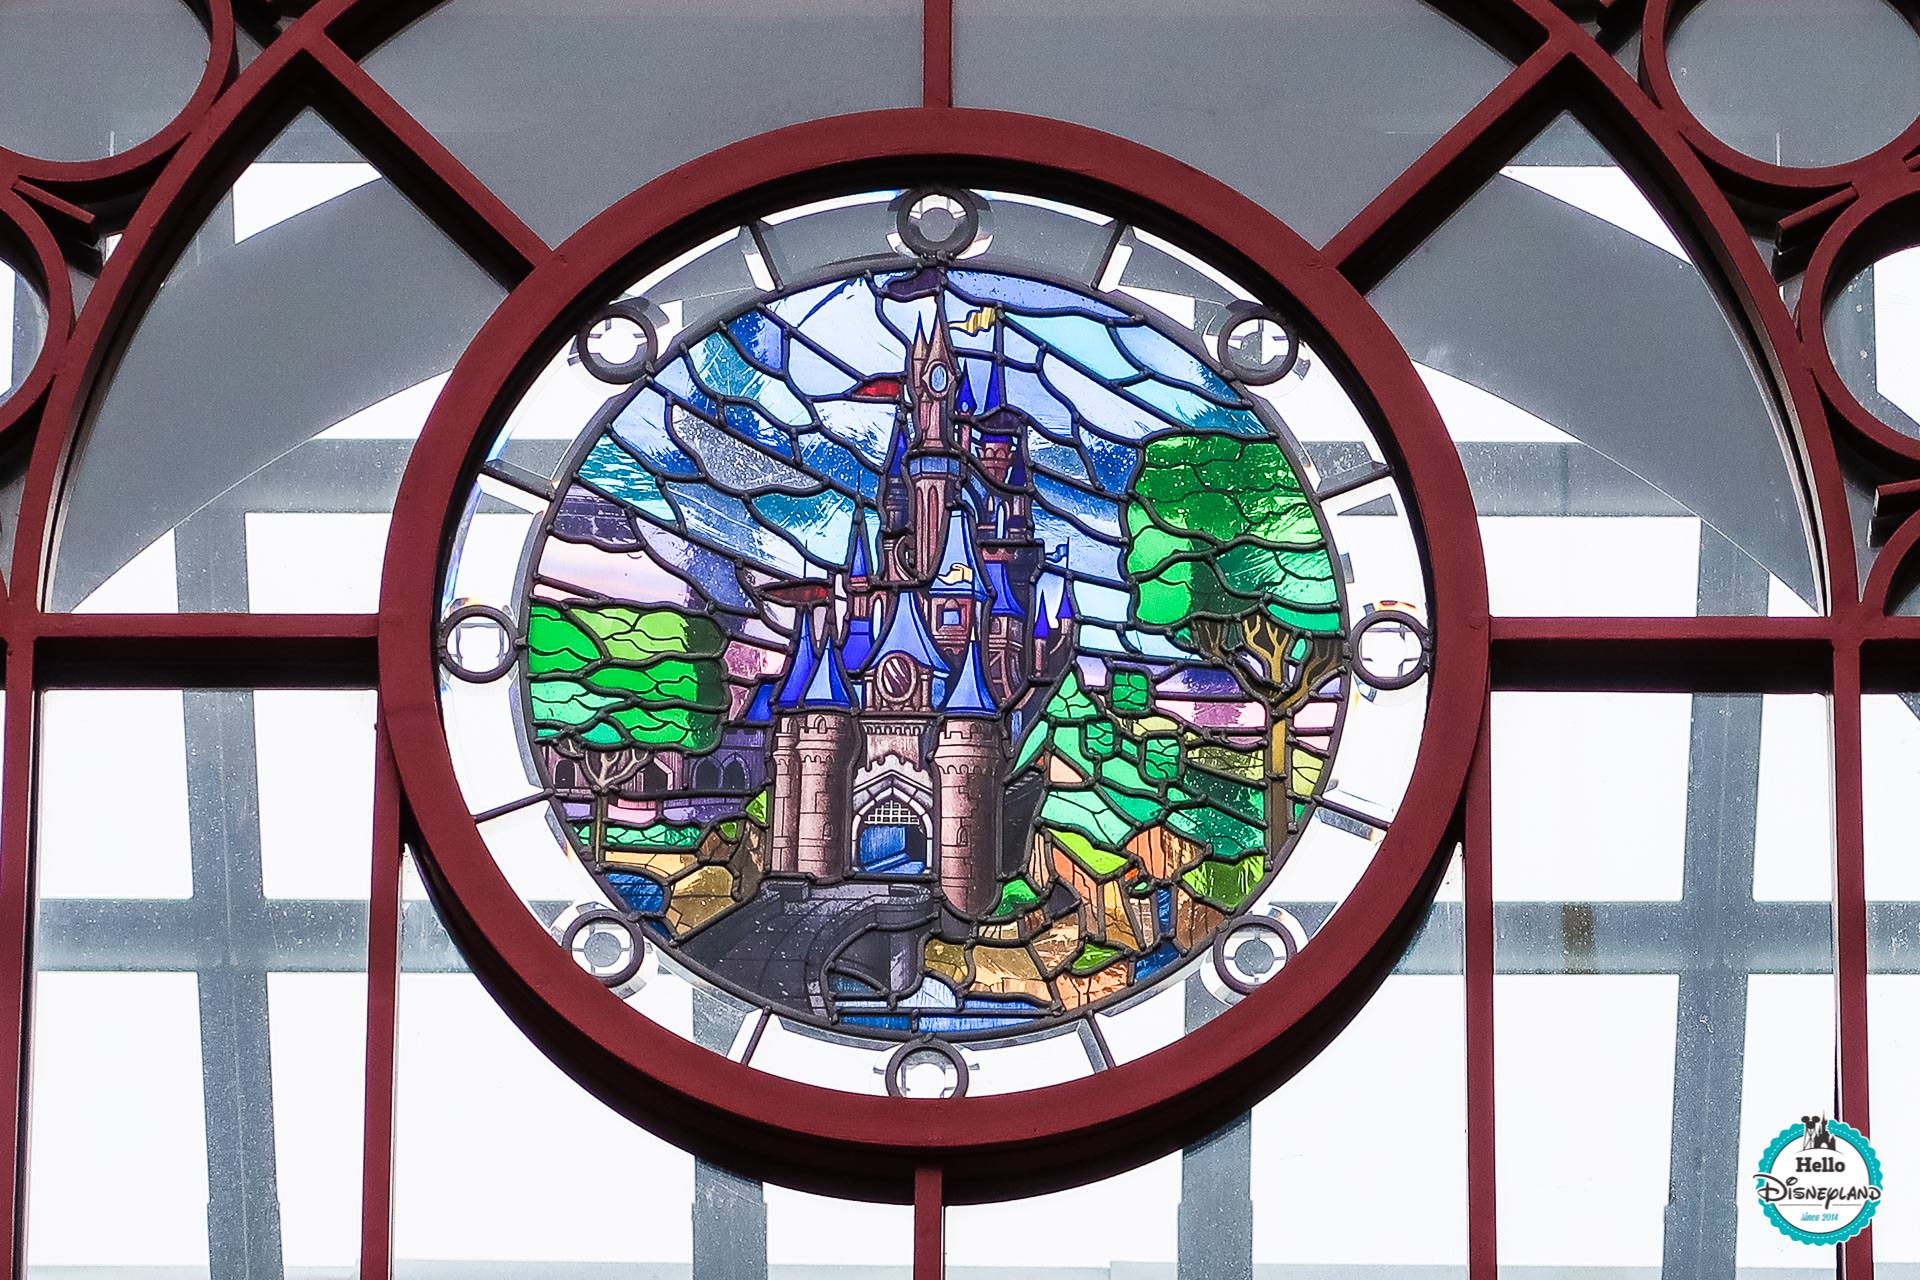 Vitrail land Fantasyland Main Street Entree Disneyland Paris